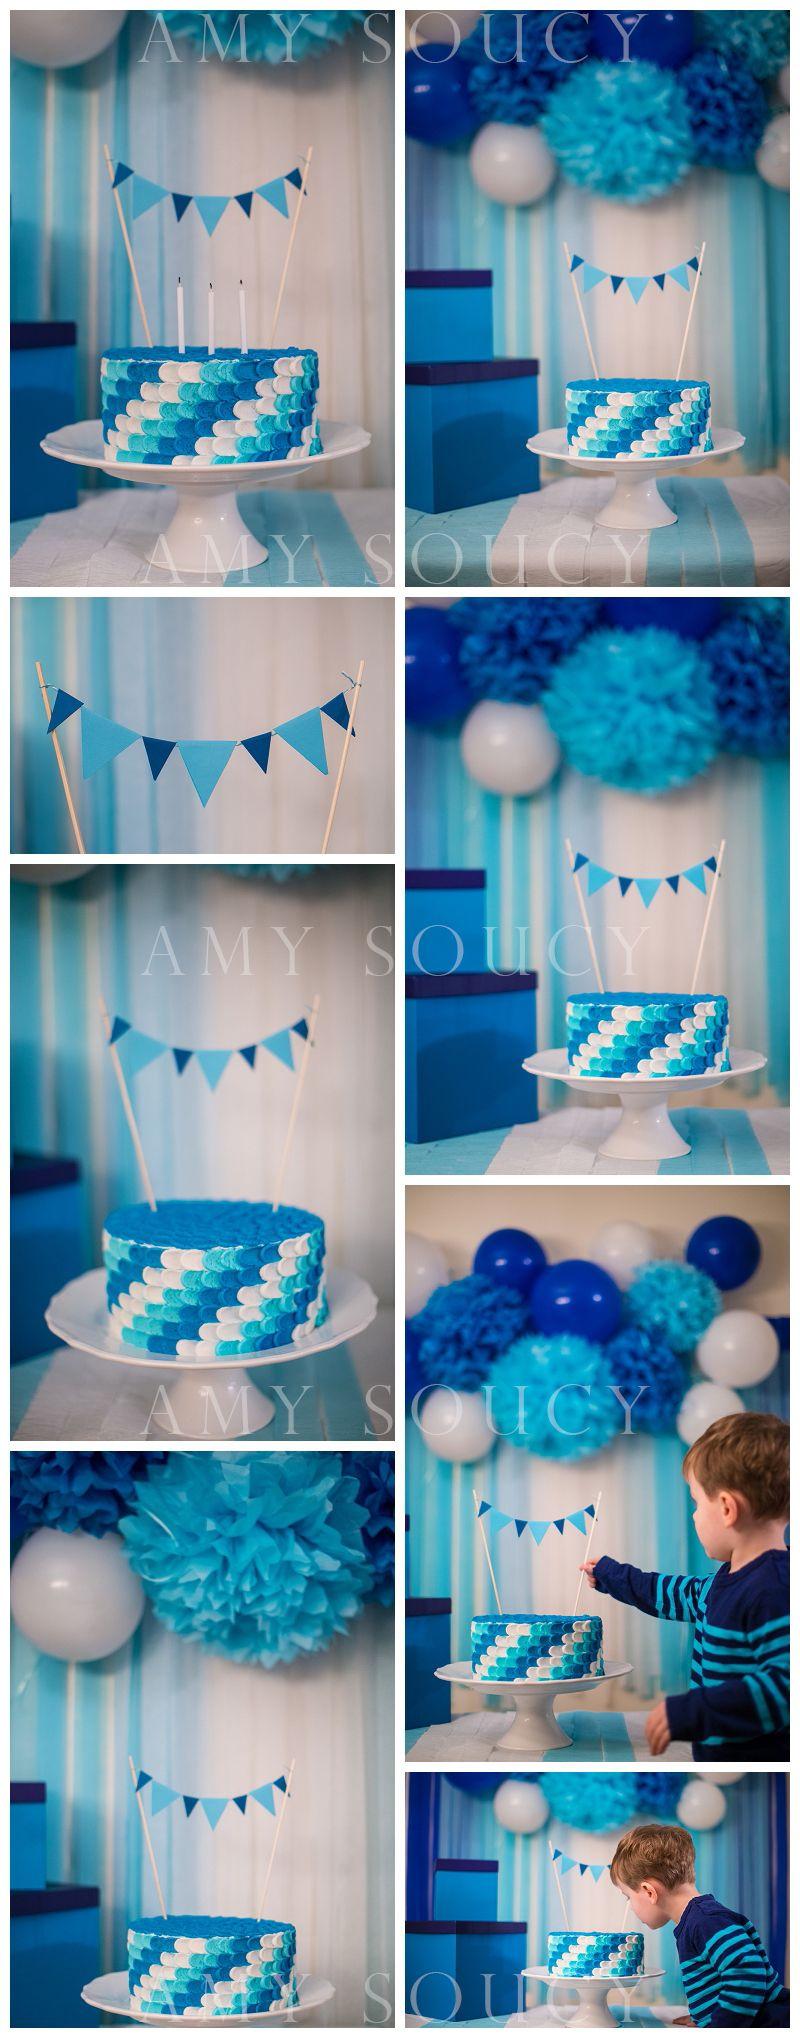 Toddler Boy Blue Birthday Cake Ombre Blues Asoucy Com Blue